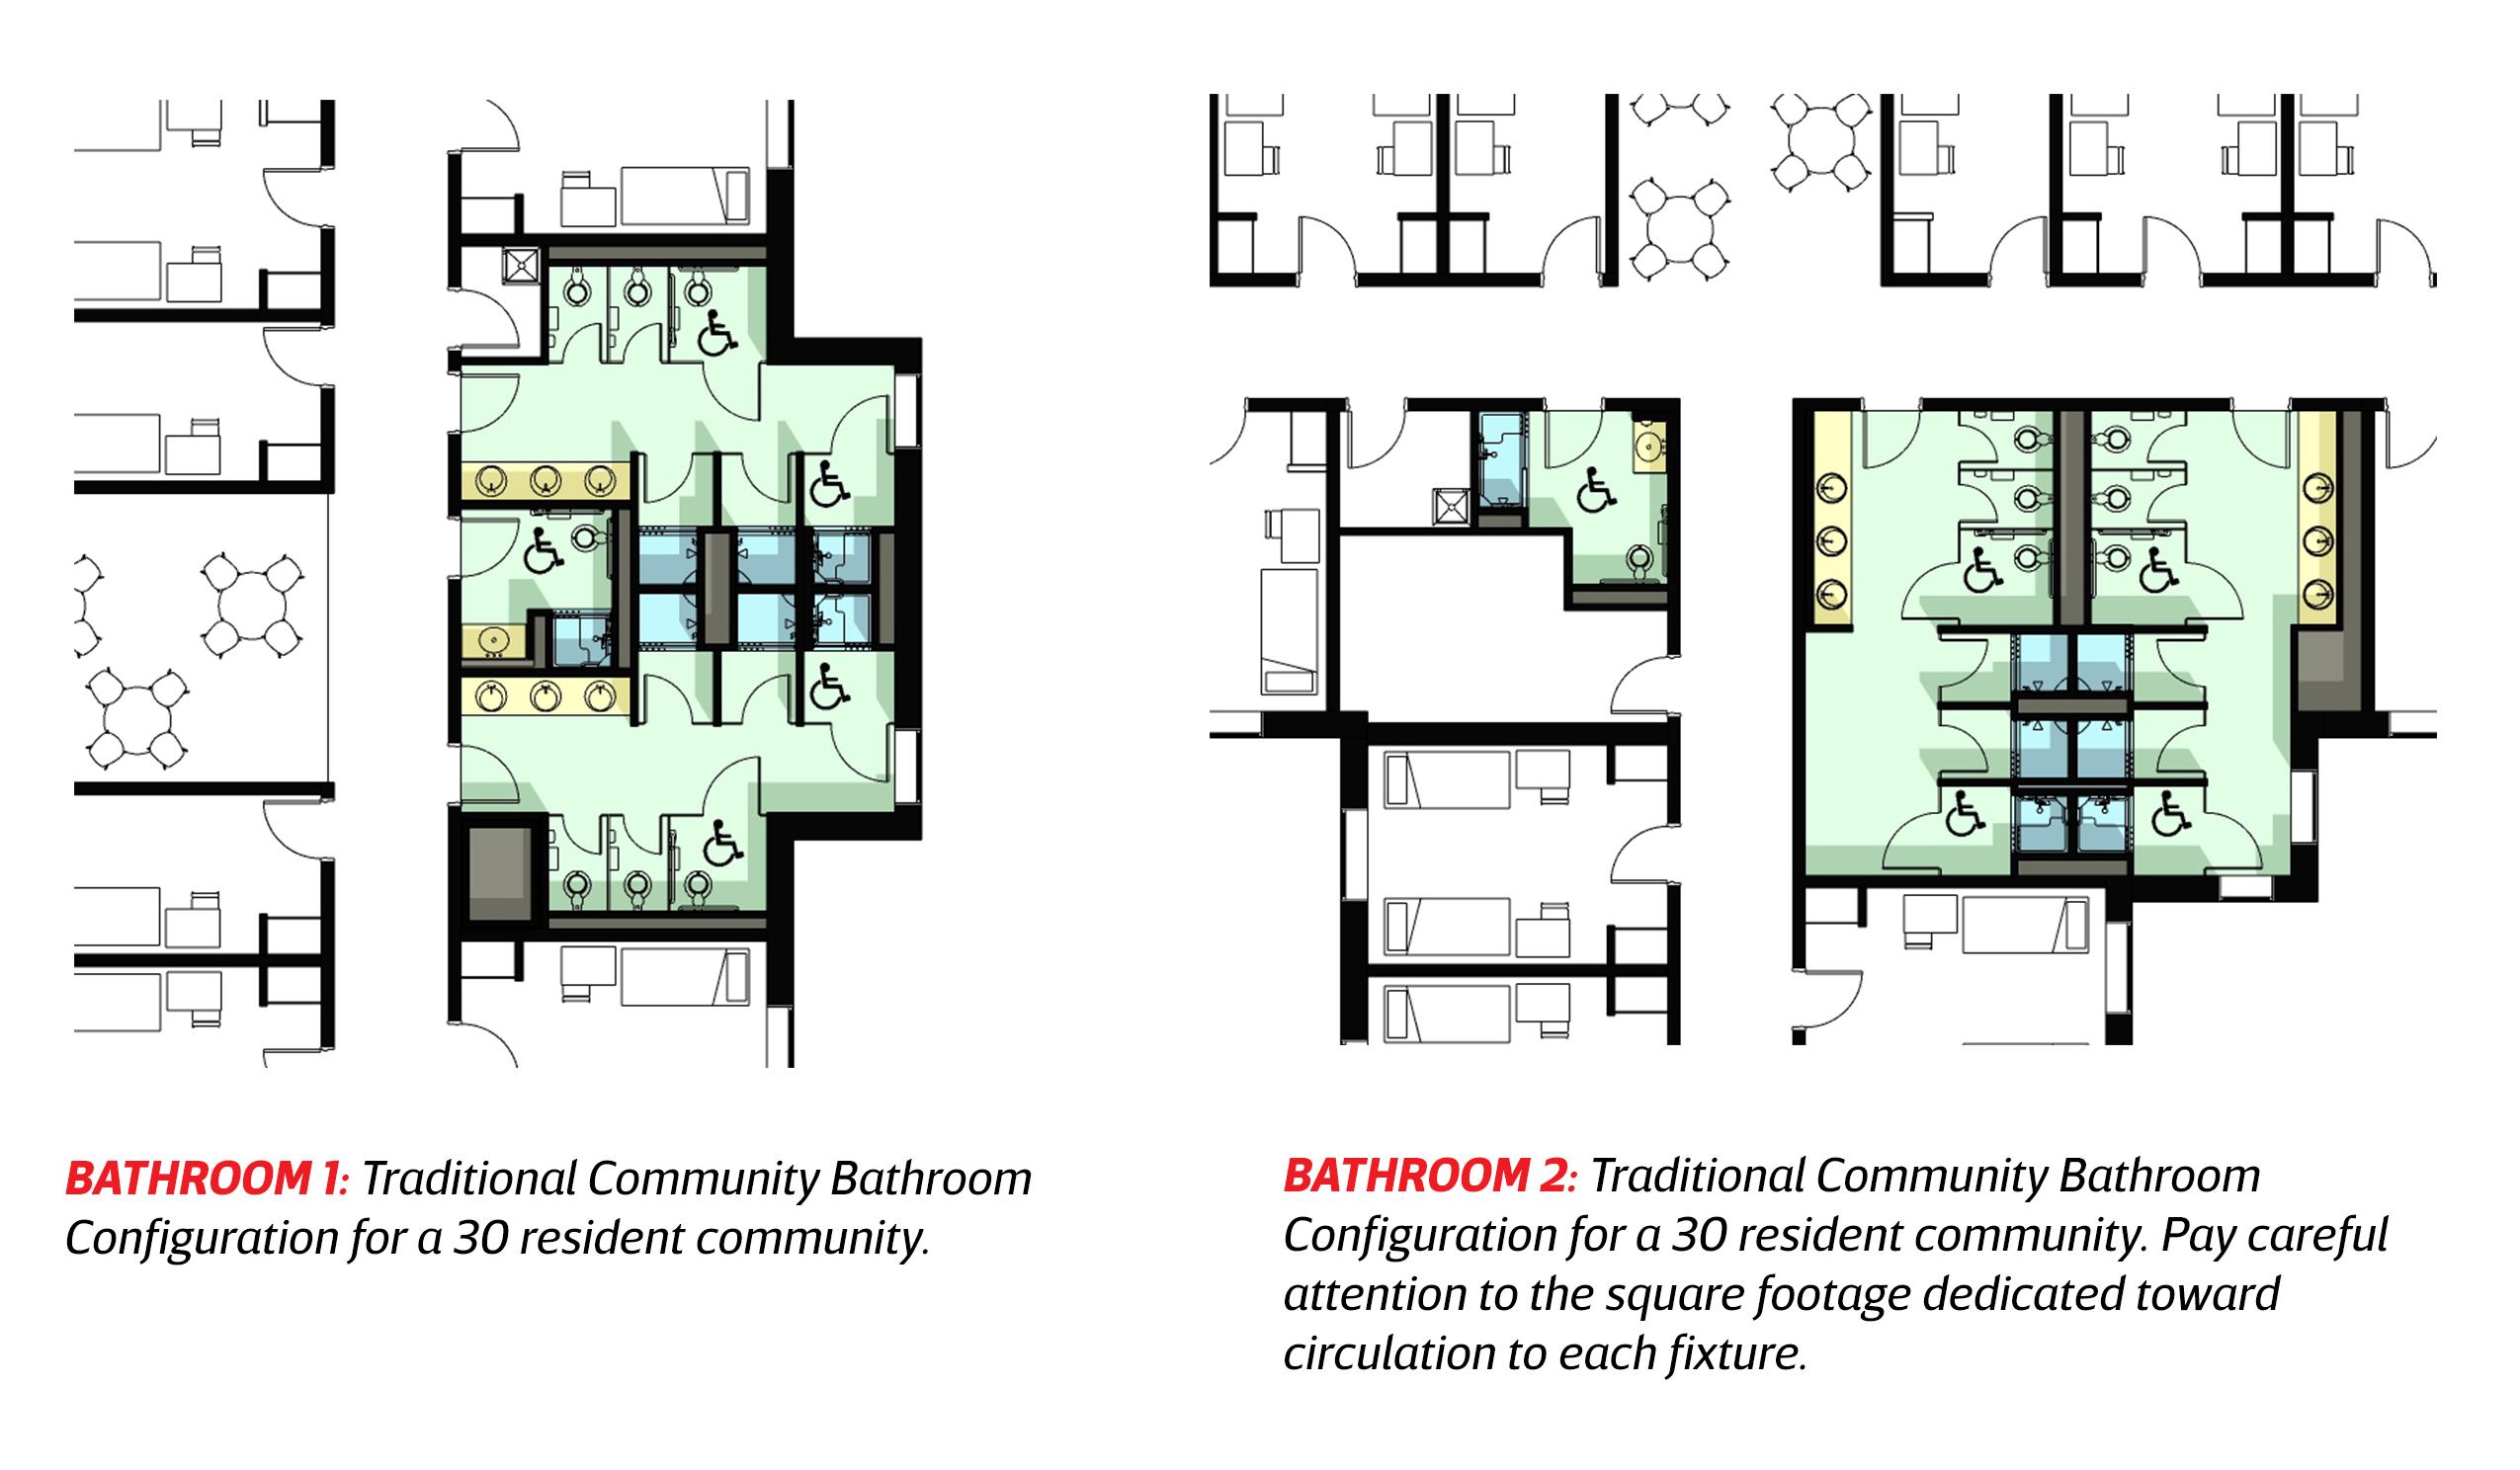 Bathroom configurations_1